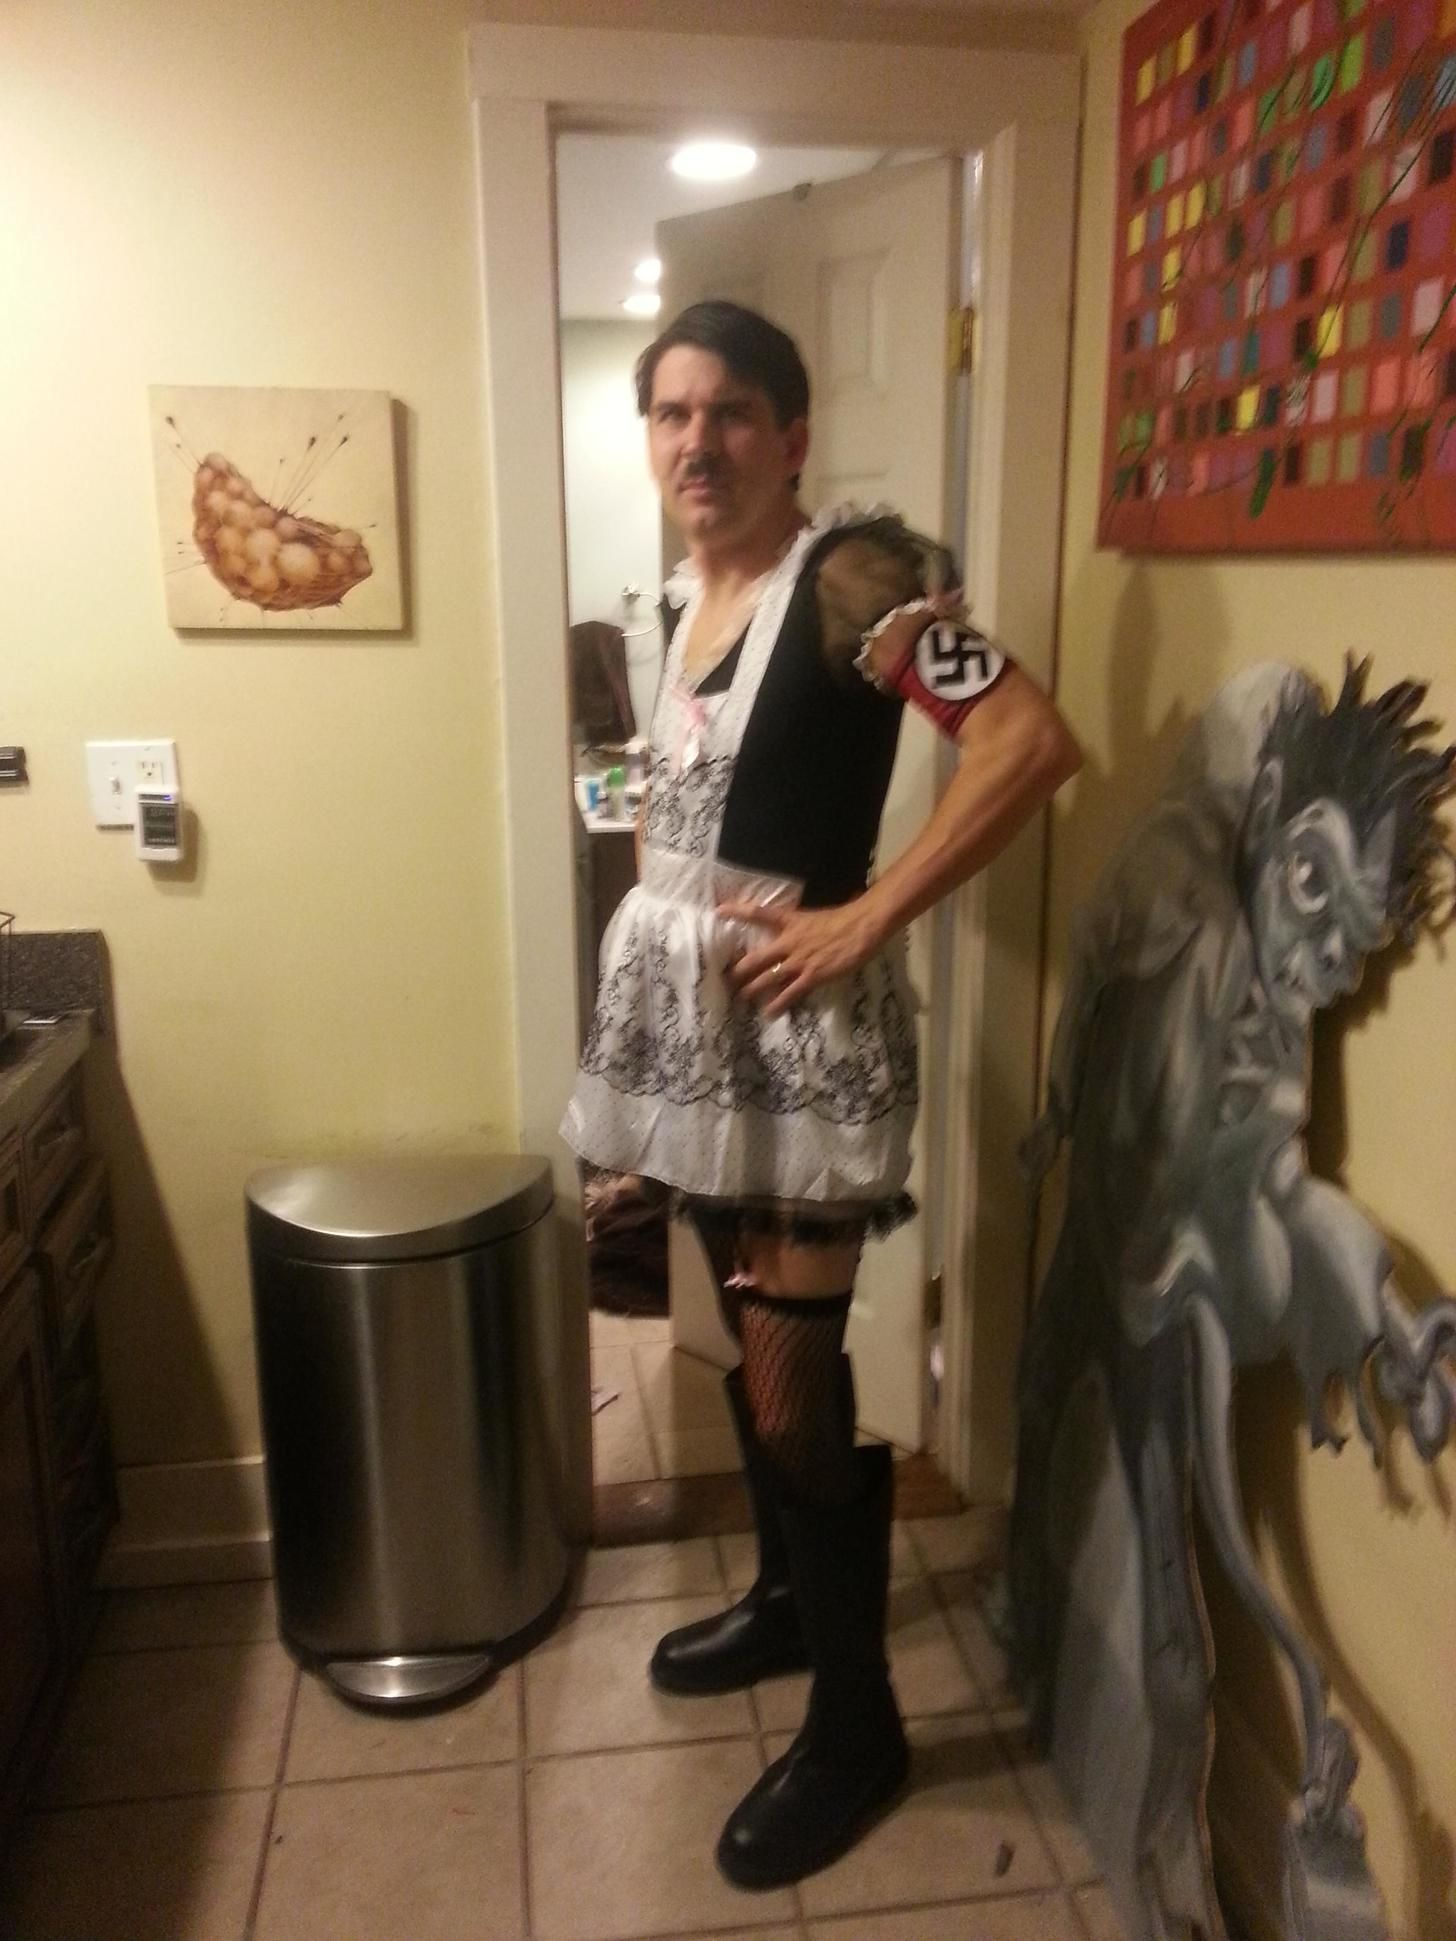 french maid-olf hitler | halloween costumes | pinterest | halloween